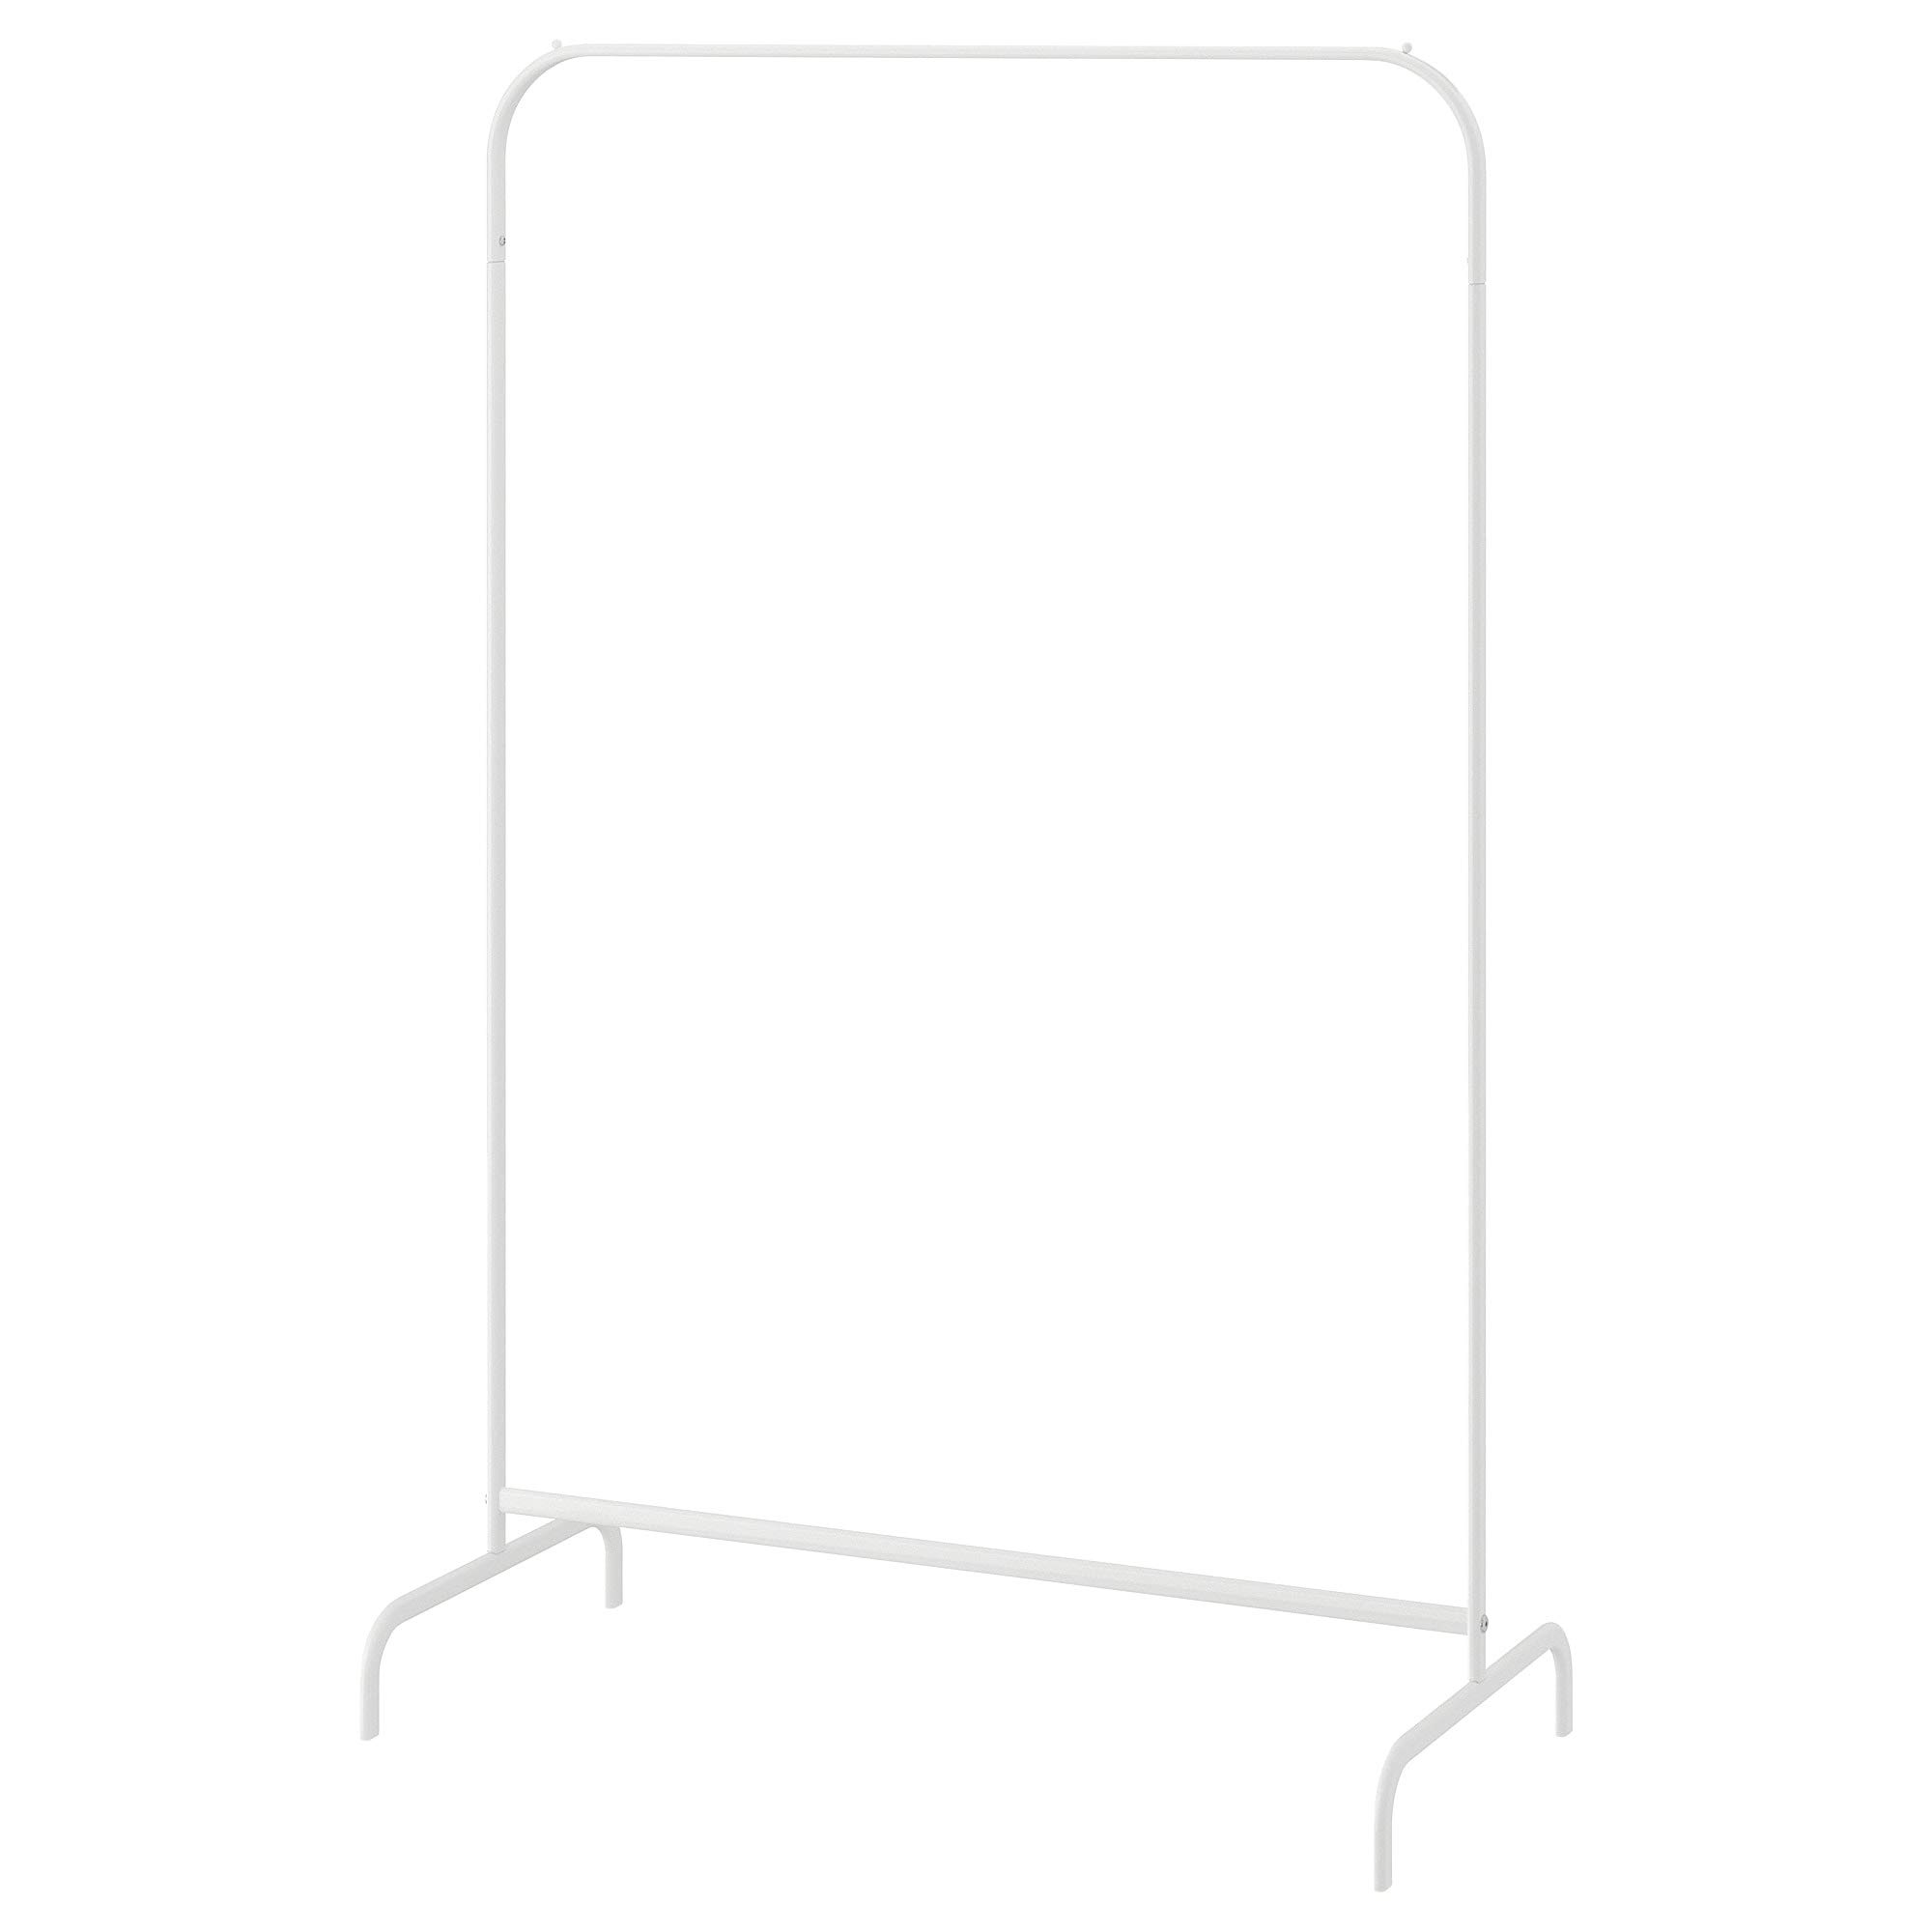 Ikea MULIG Clothes Rack, White, 99x46 cm (39x18 1/8